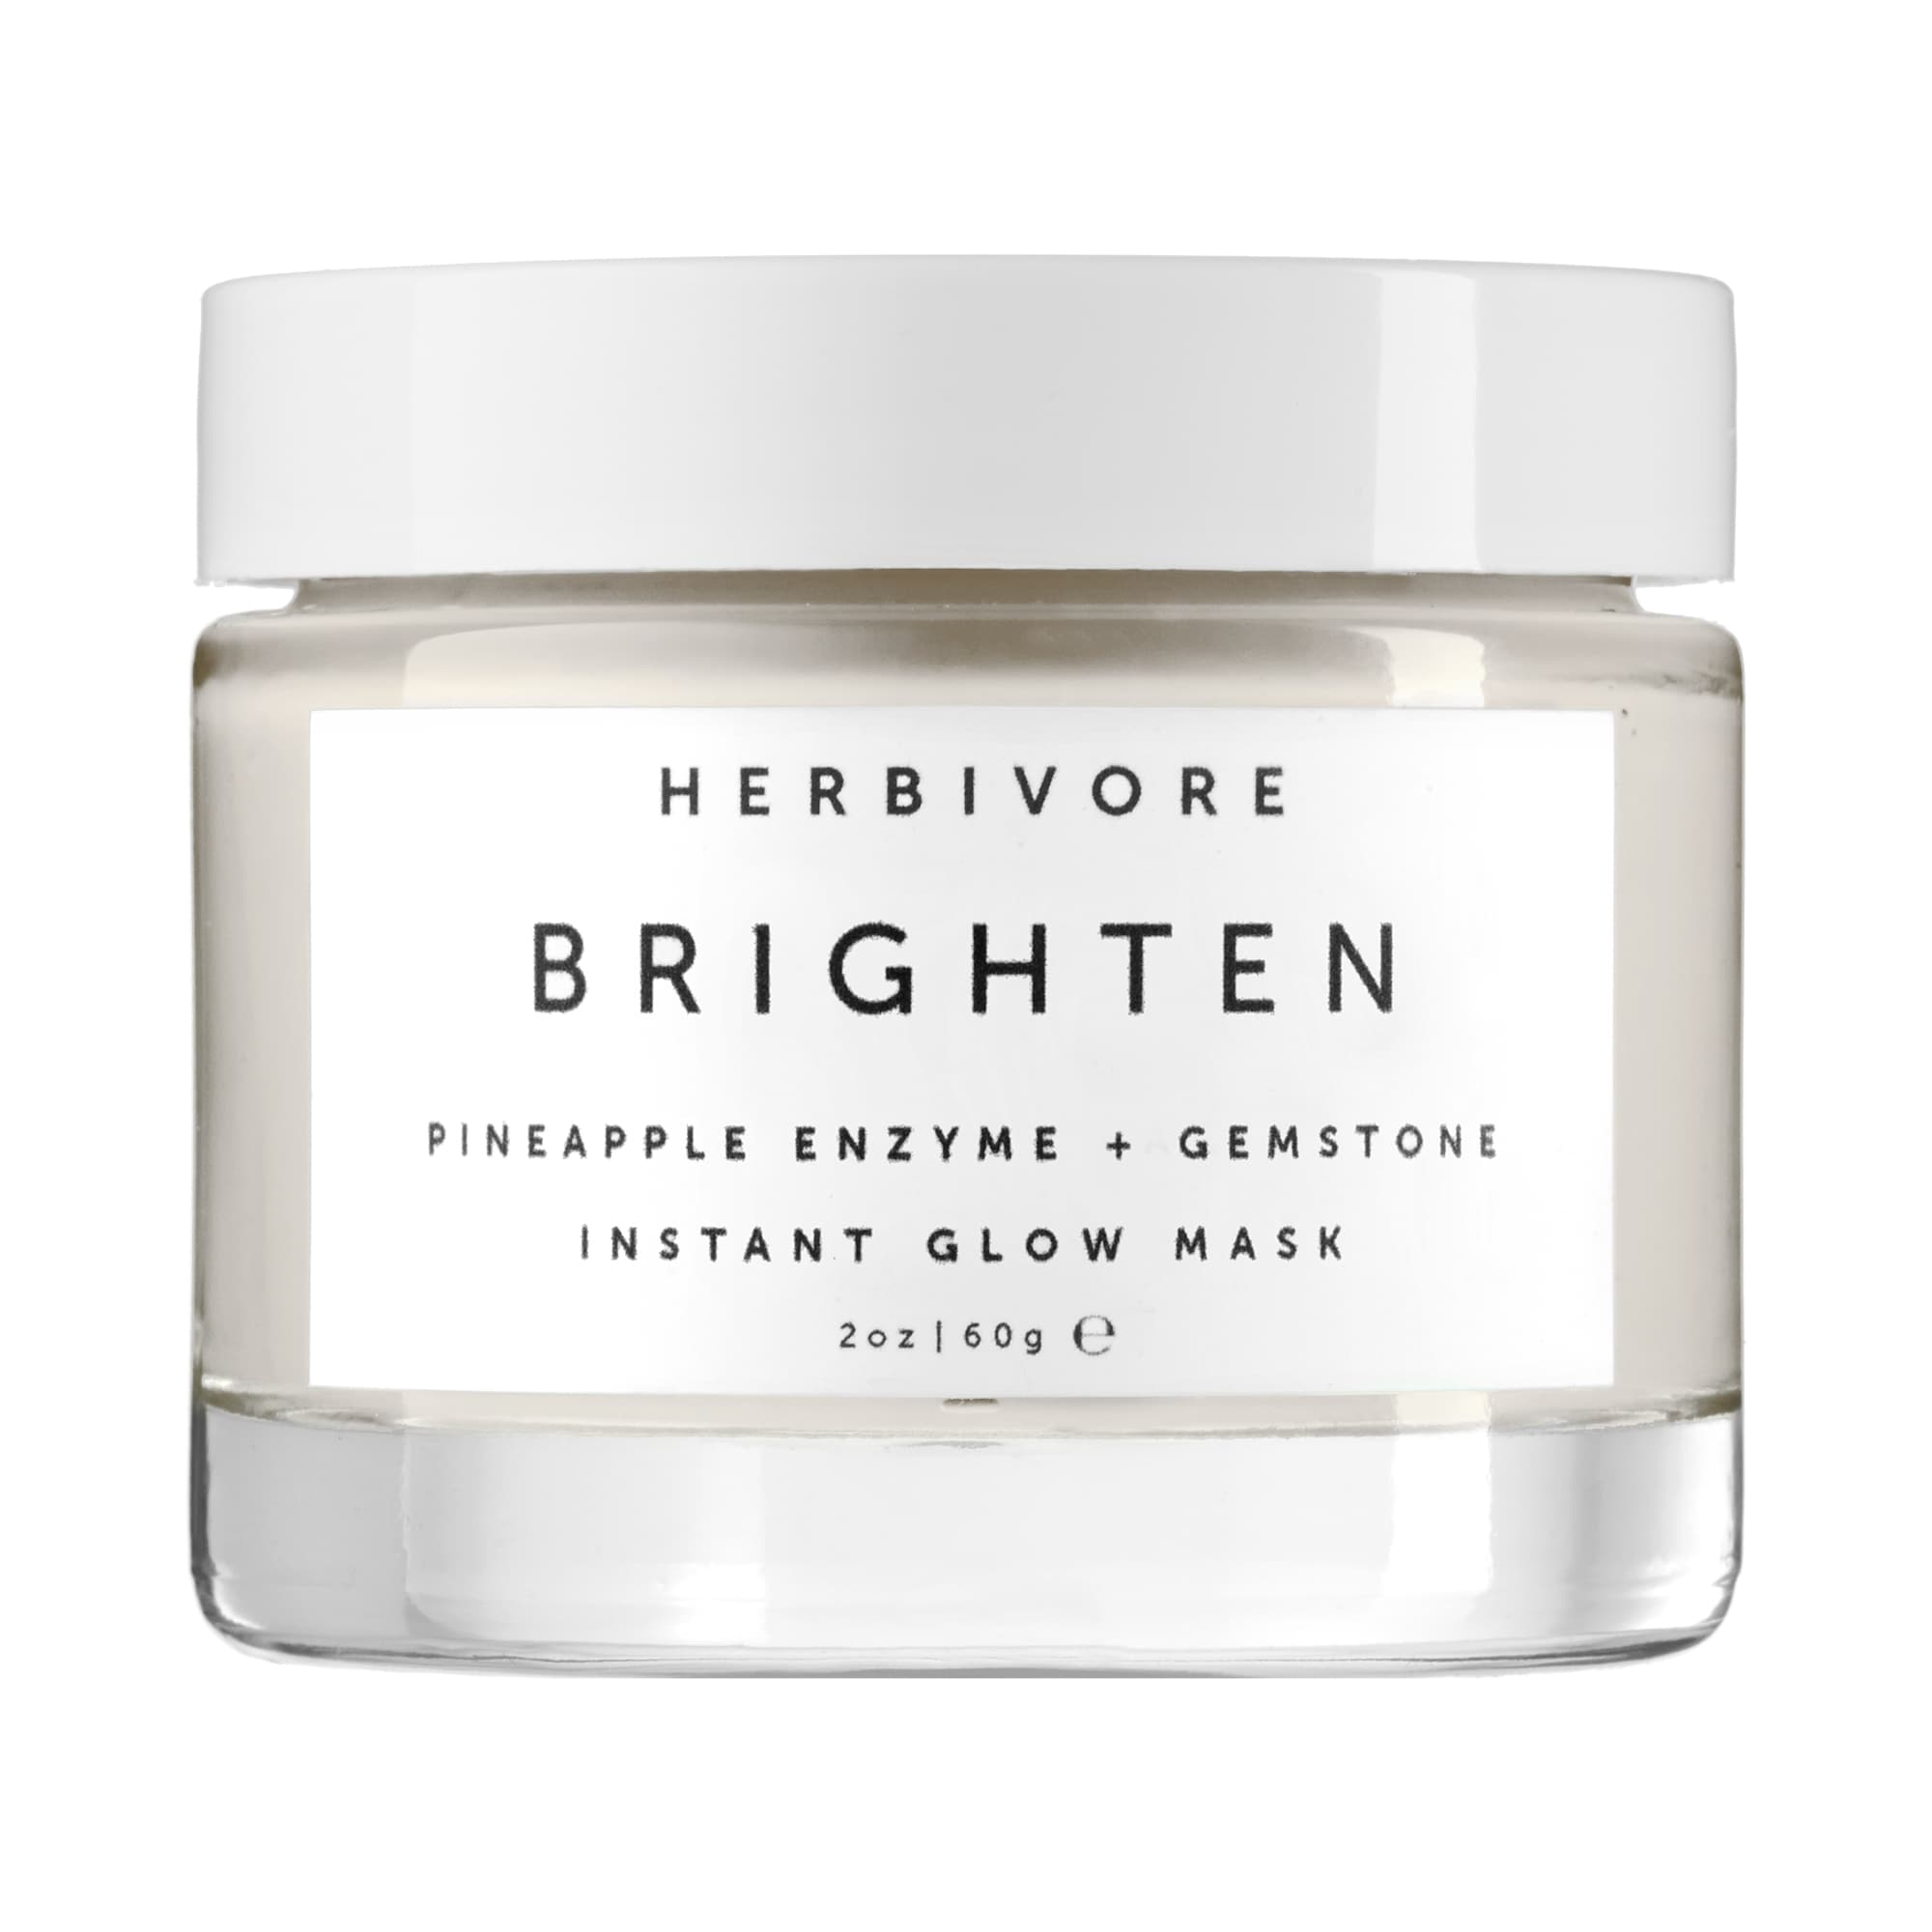 Herbivore - Brighten Pineapple Enzyme + Gemstone Instant Glow Mask